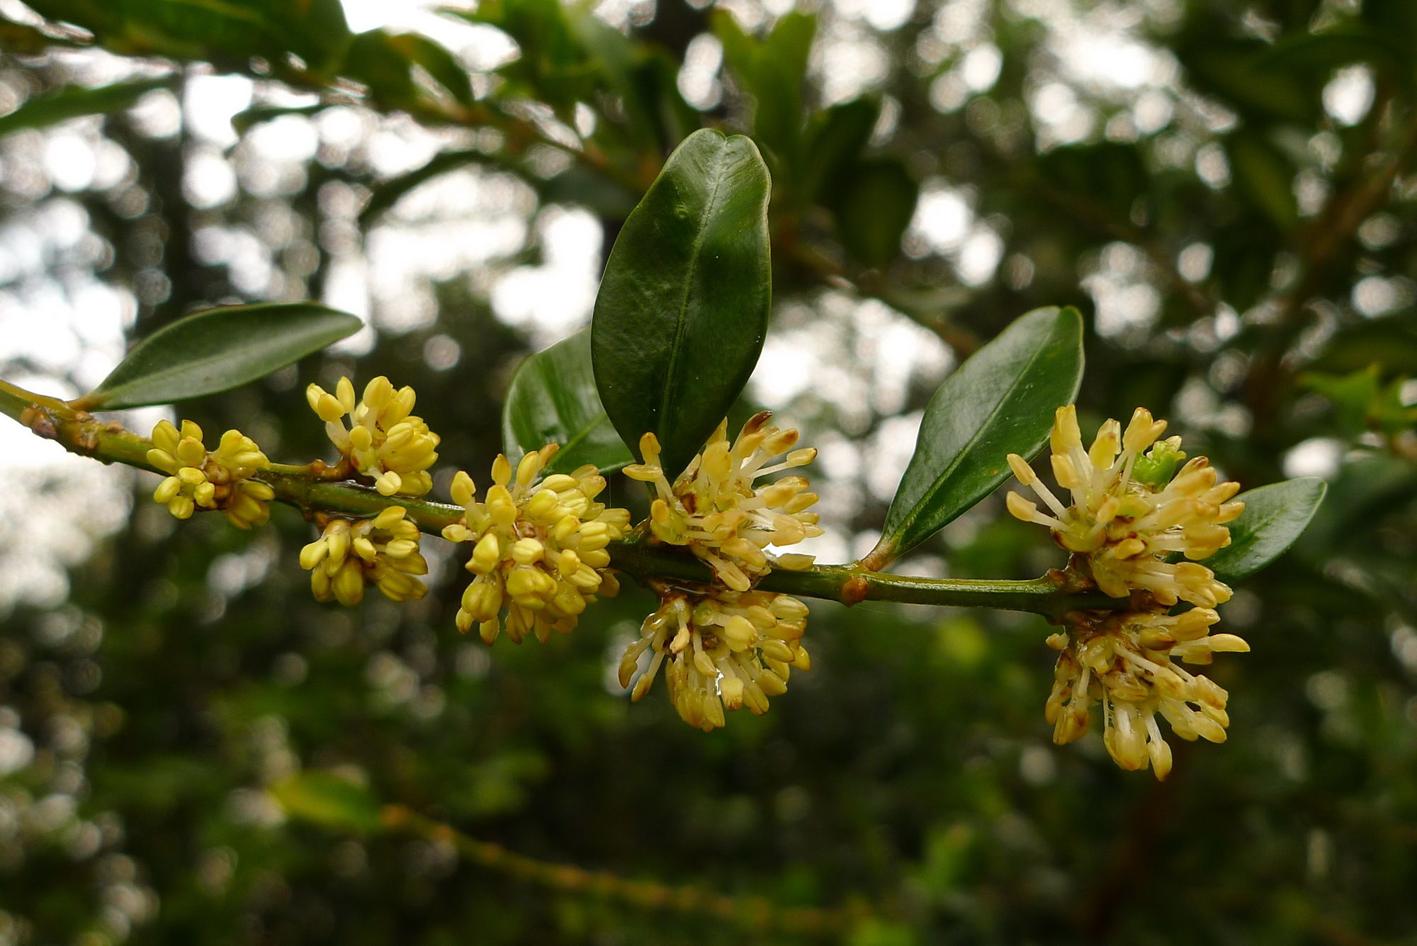 Flower-of-boxwood-herb